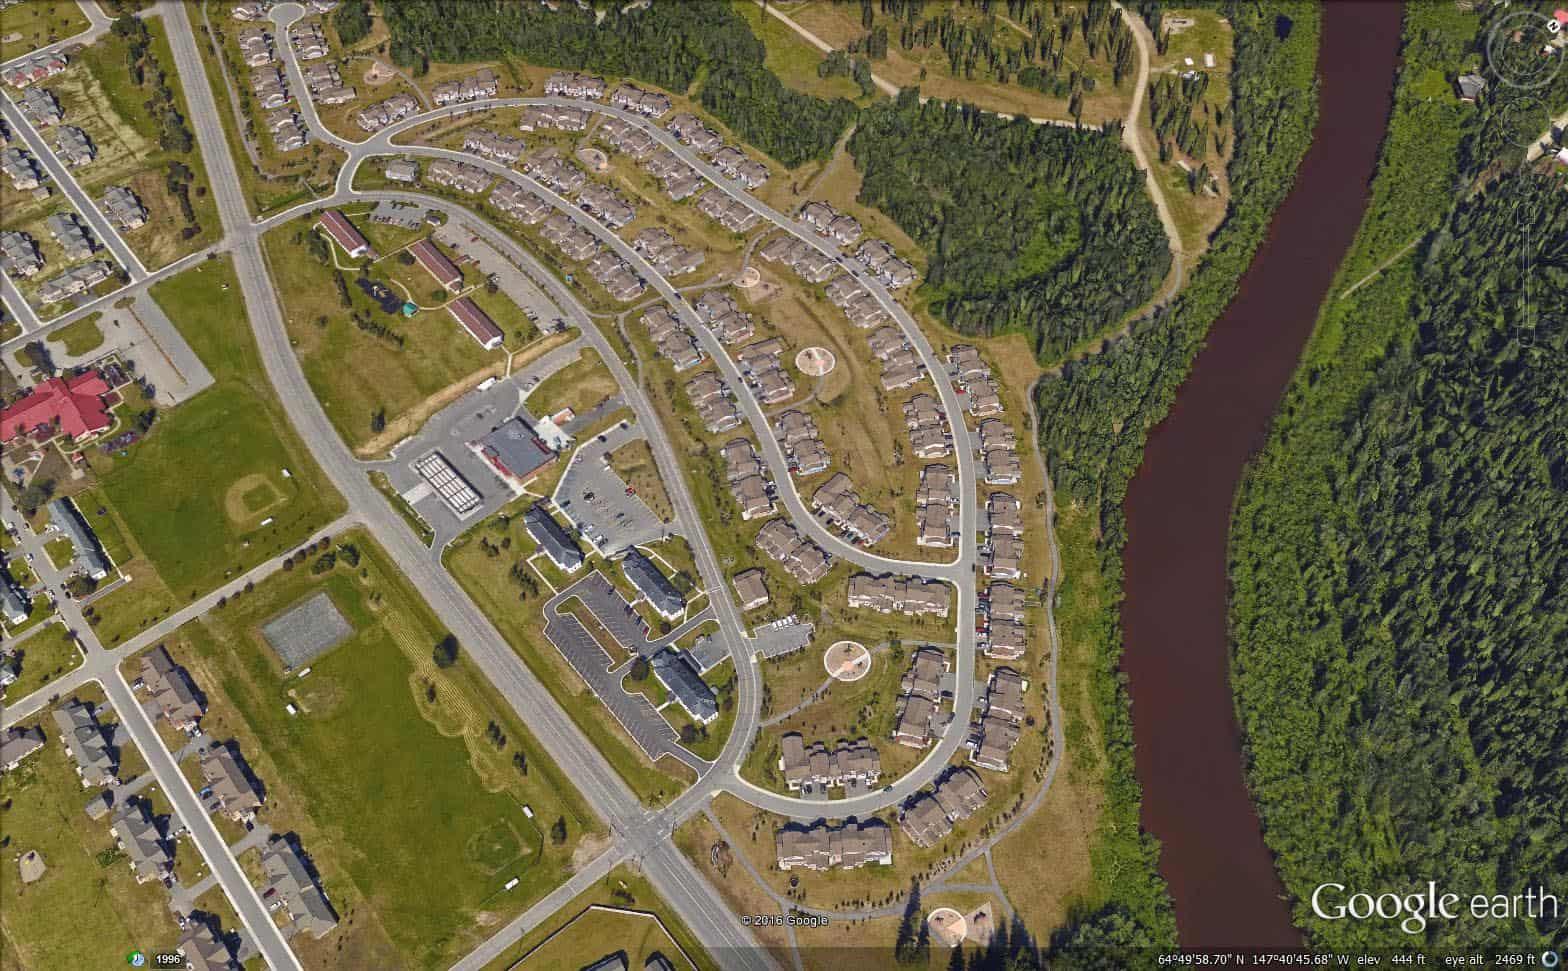 FTW 296 297 298 Denali Village Housing